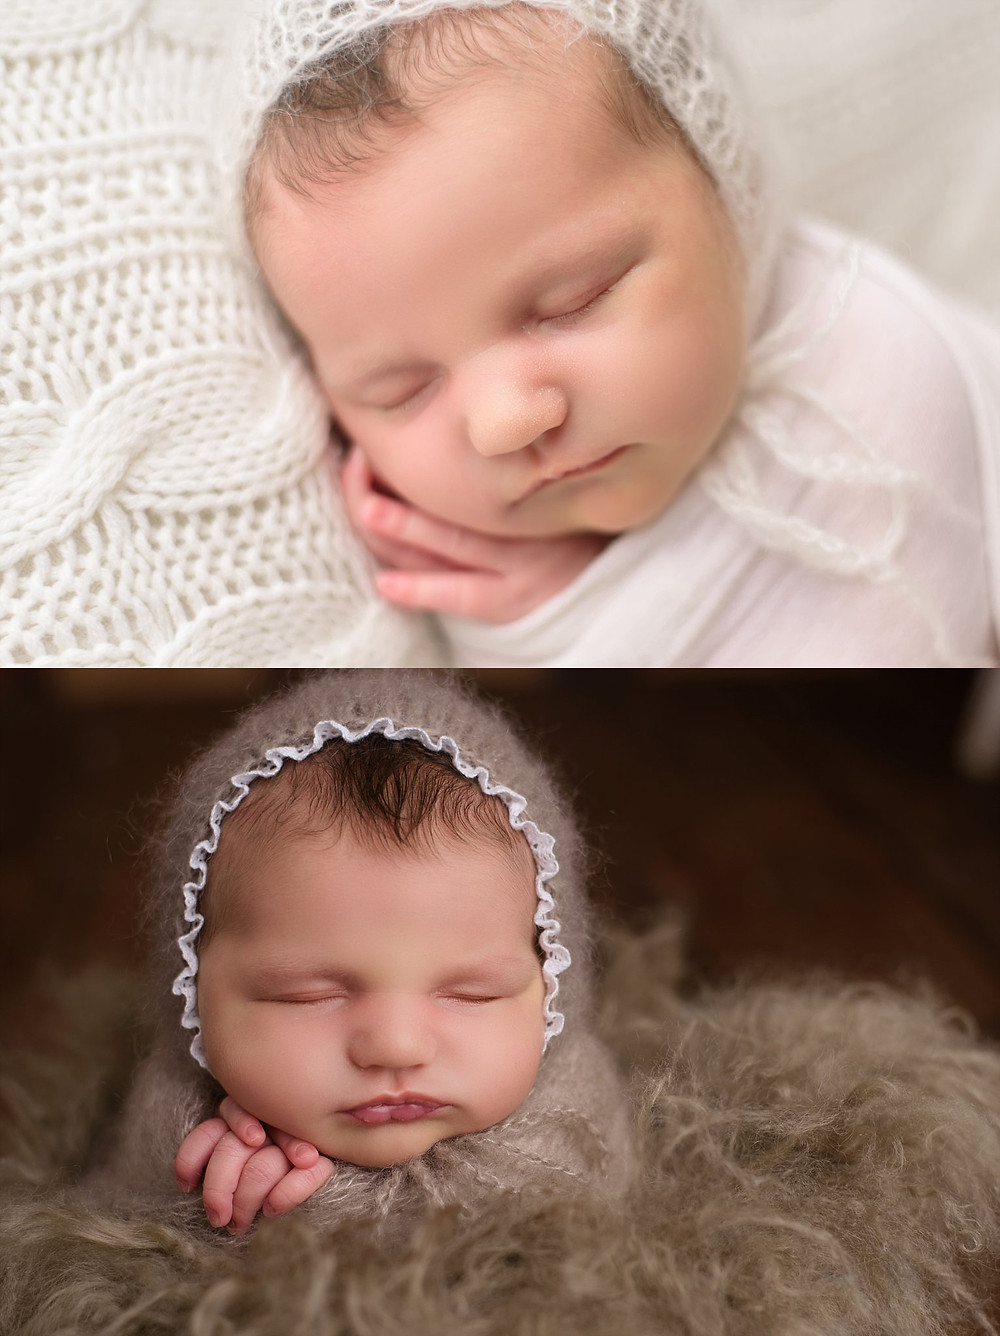 Newborn Studio Photographer Victoria BC Canada, Fawn Lily Photography, Sidney BC Photography